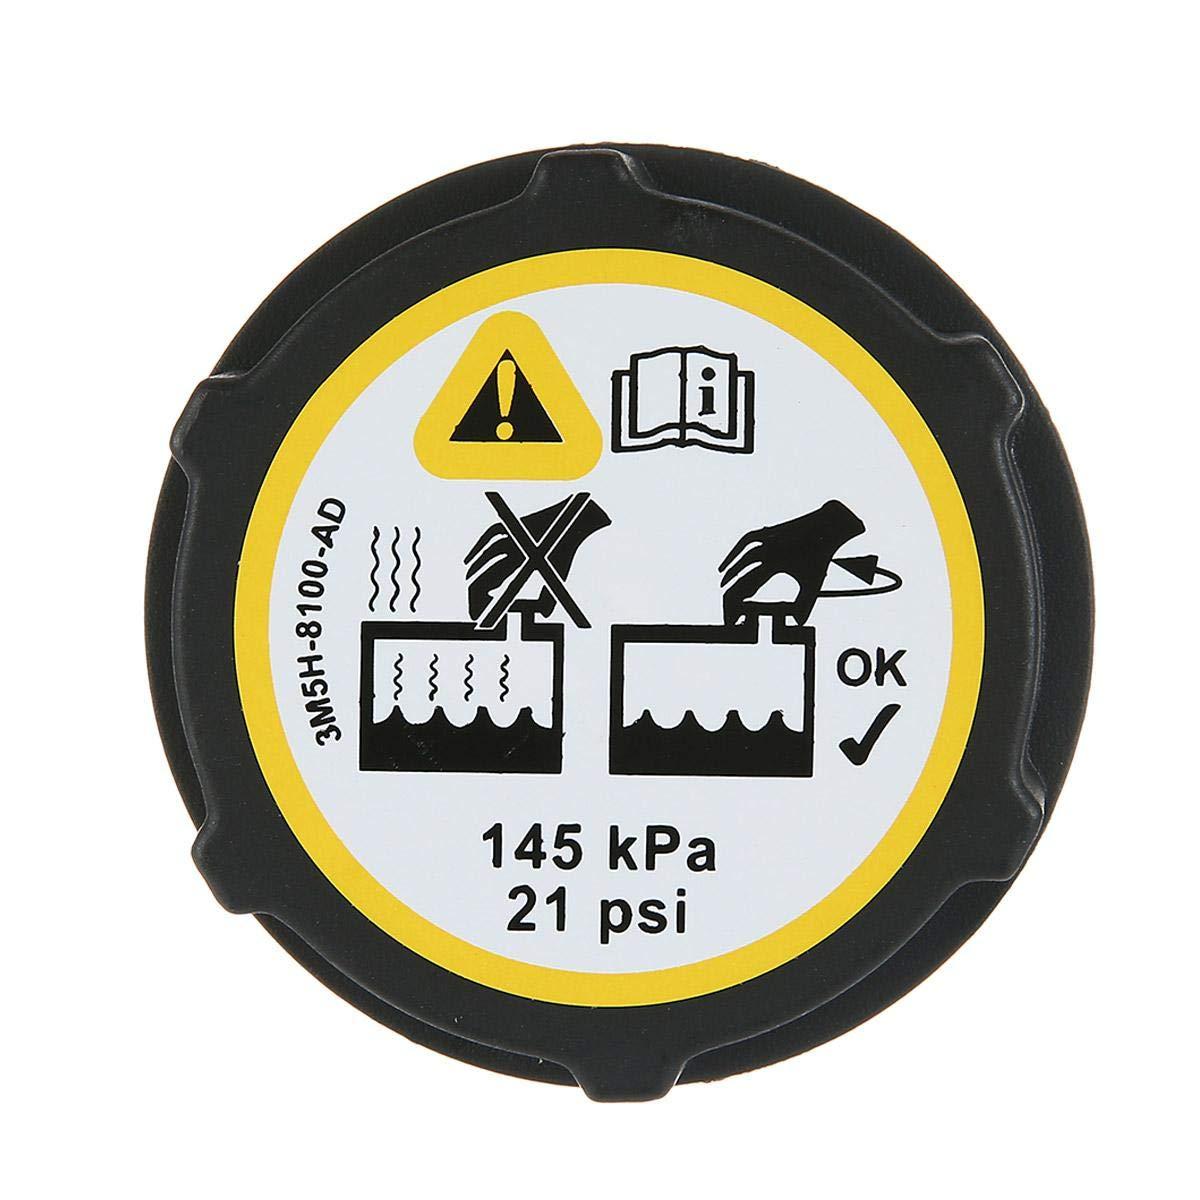 DokFin Expansion Tank Cap Radiator Cap for Ford//Focus//Fiesta//C-max//Mondeo//Transit #1301104 3M5H-8100-AD, Black